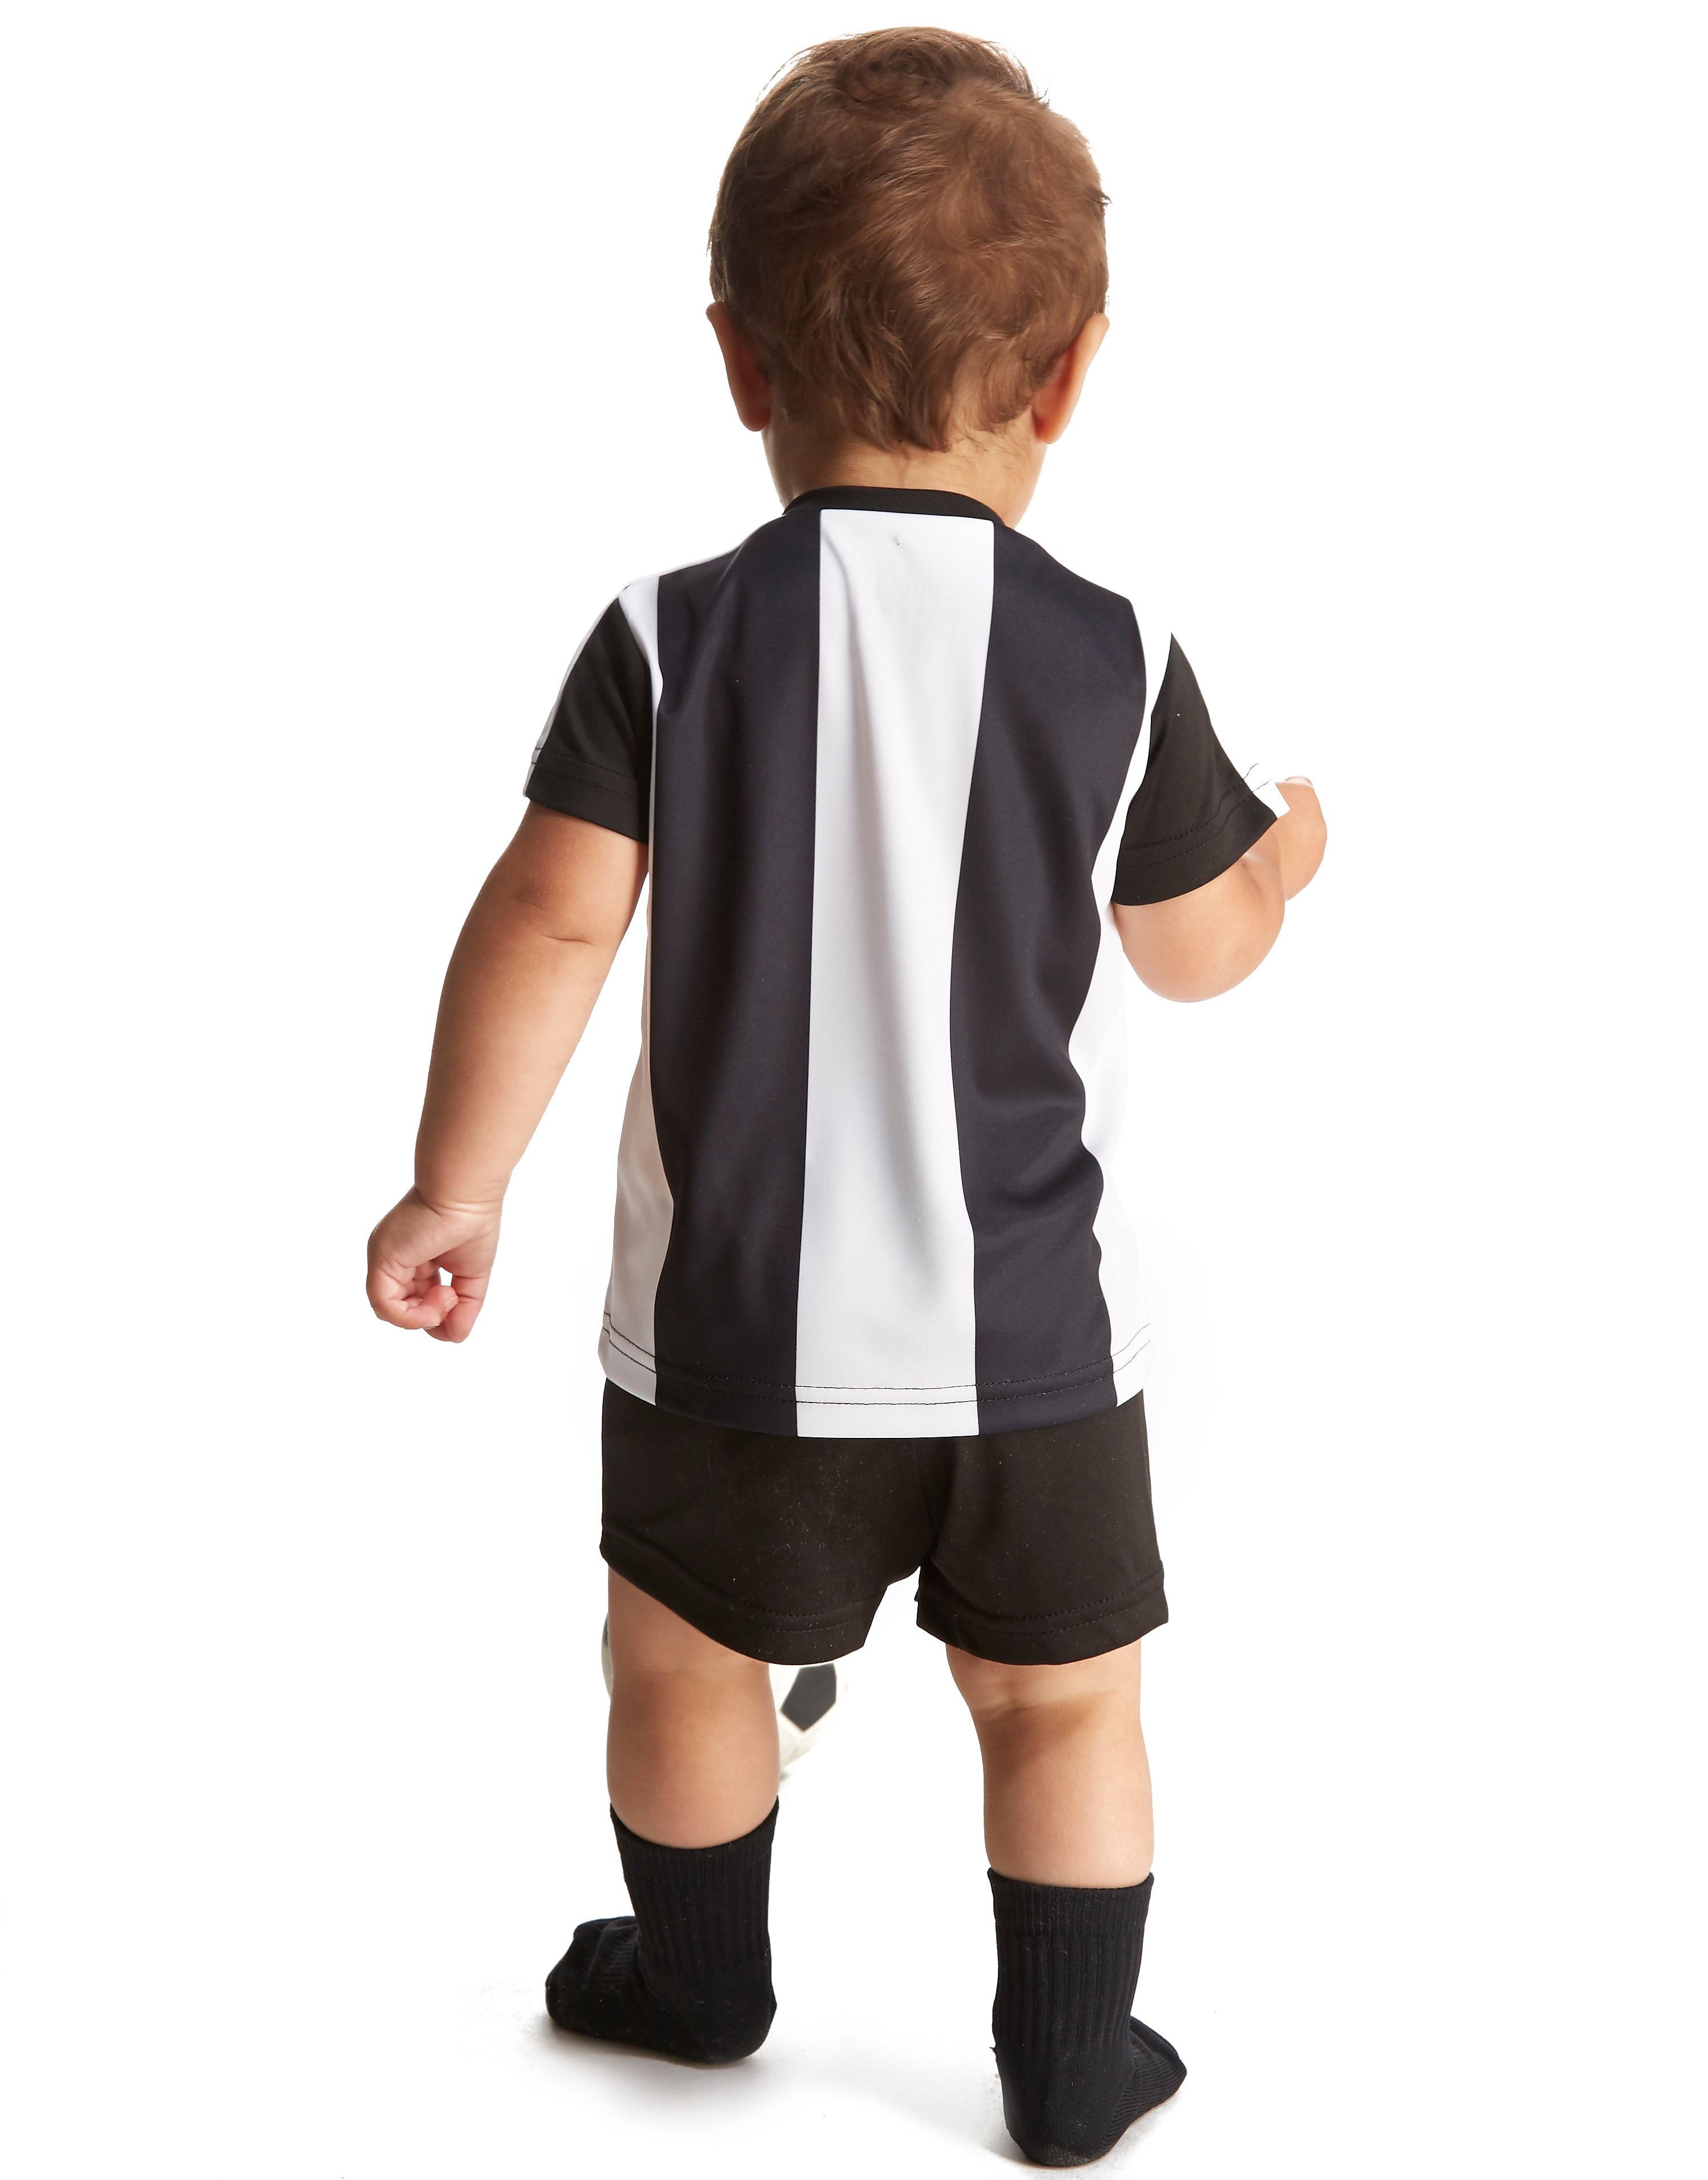 PUMA Newcastle United FC 2016/17 Home Kit Infant